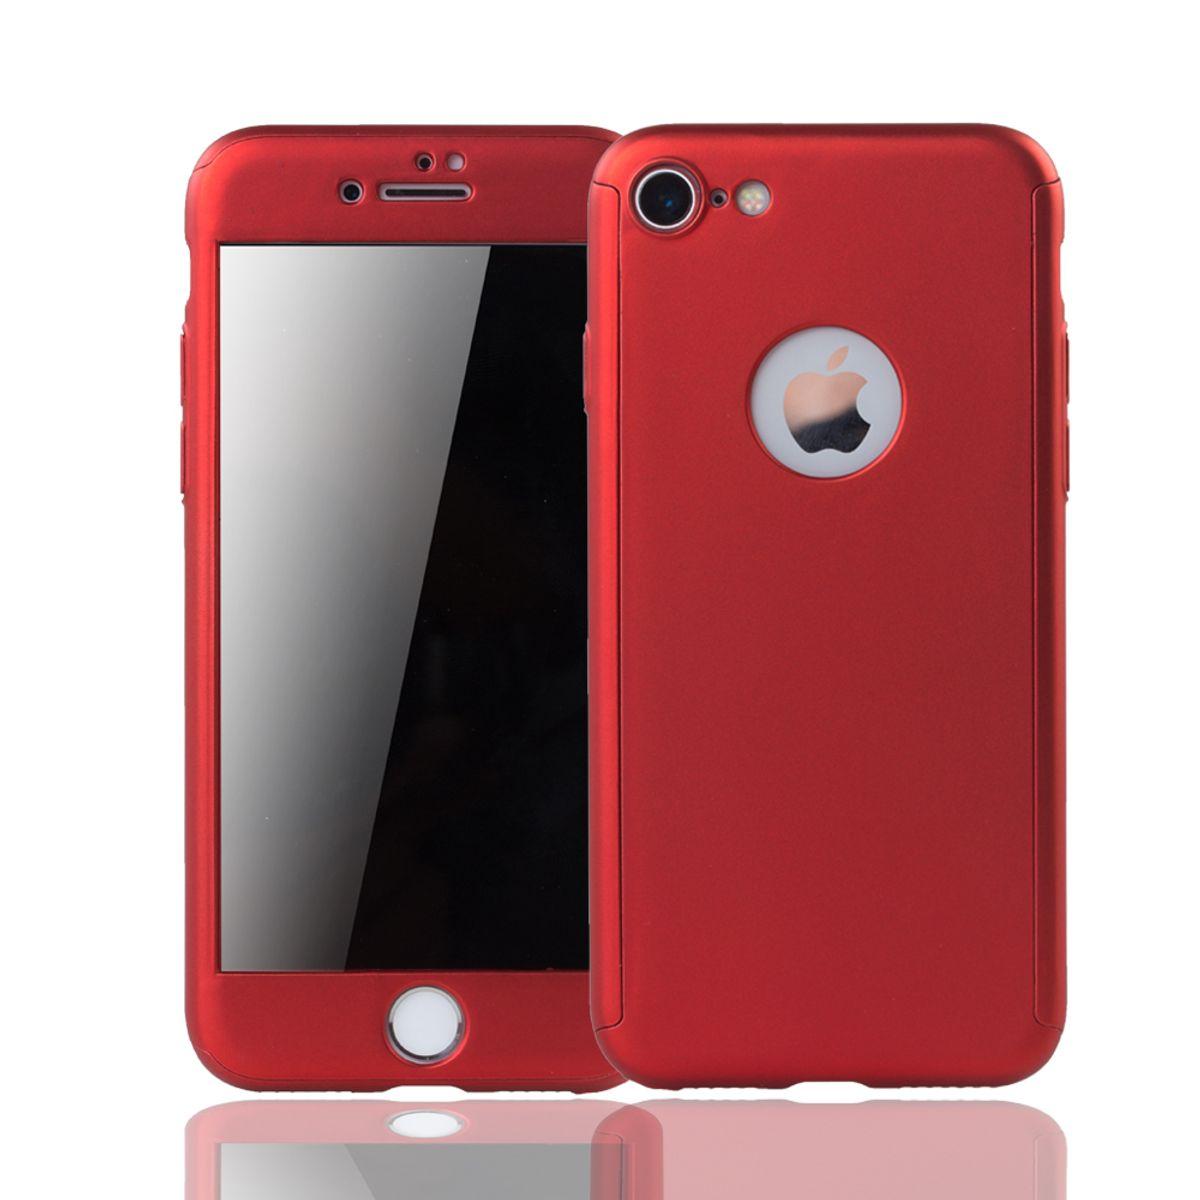 Apple iPhone 8 Handy Hülle Schutz-Case 360 Full-Cover Panzer Schutz Glas Rot